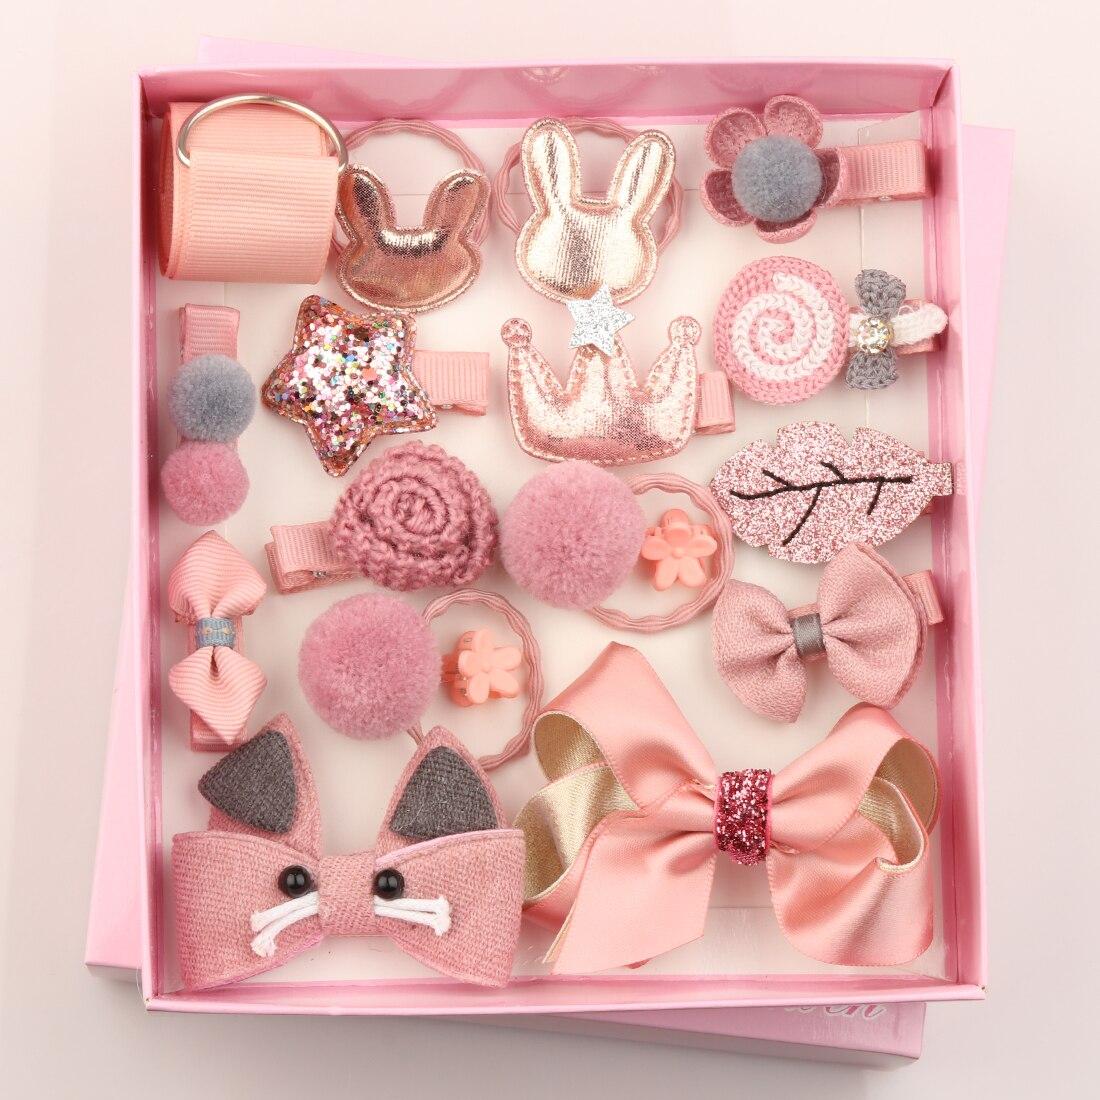 18pcs/box Girls Birthday Gift Set Sweet Head Wears Cartoon Hairpins Kid Hair Bows Barrettes Pom Pom Ball Rabbit Rubber Bands Delaying Senility